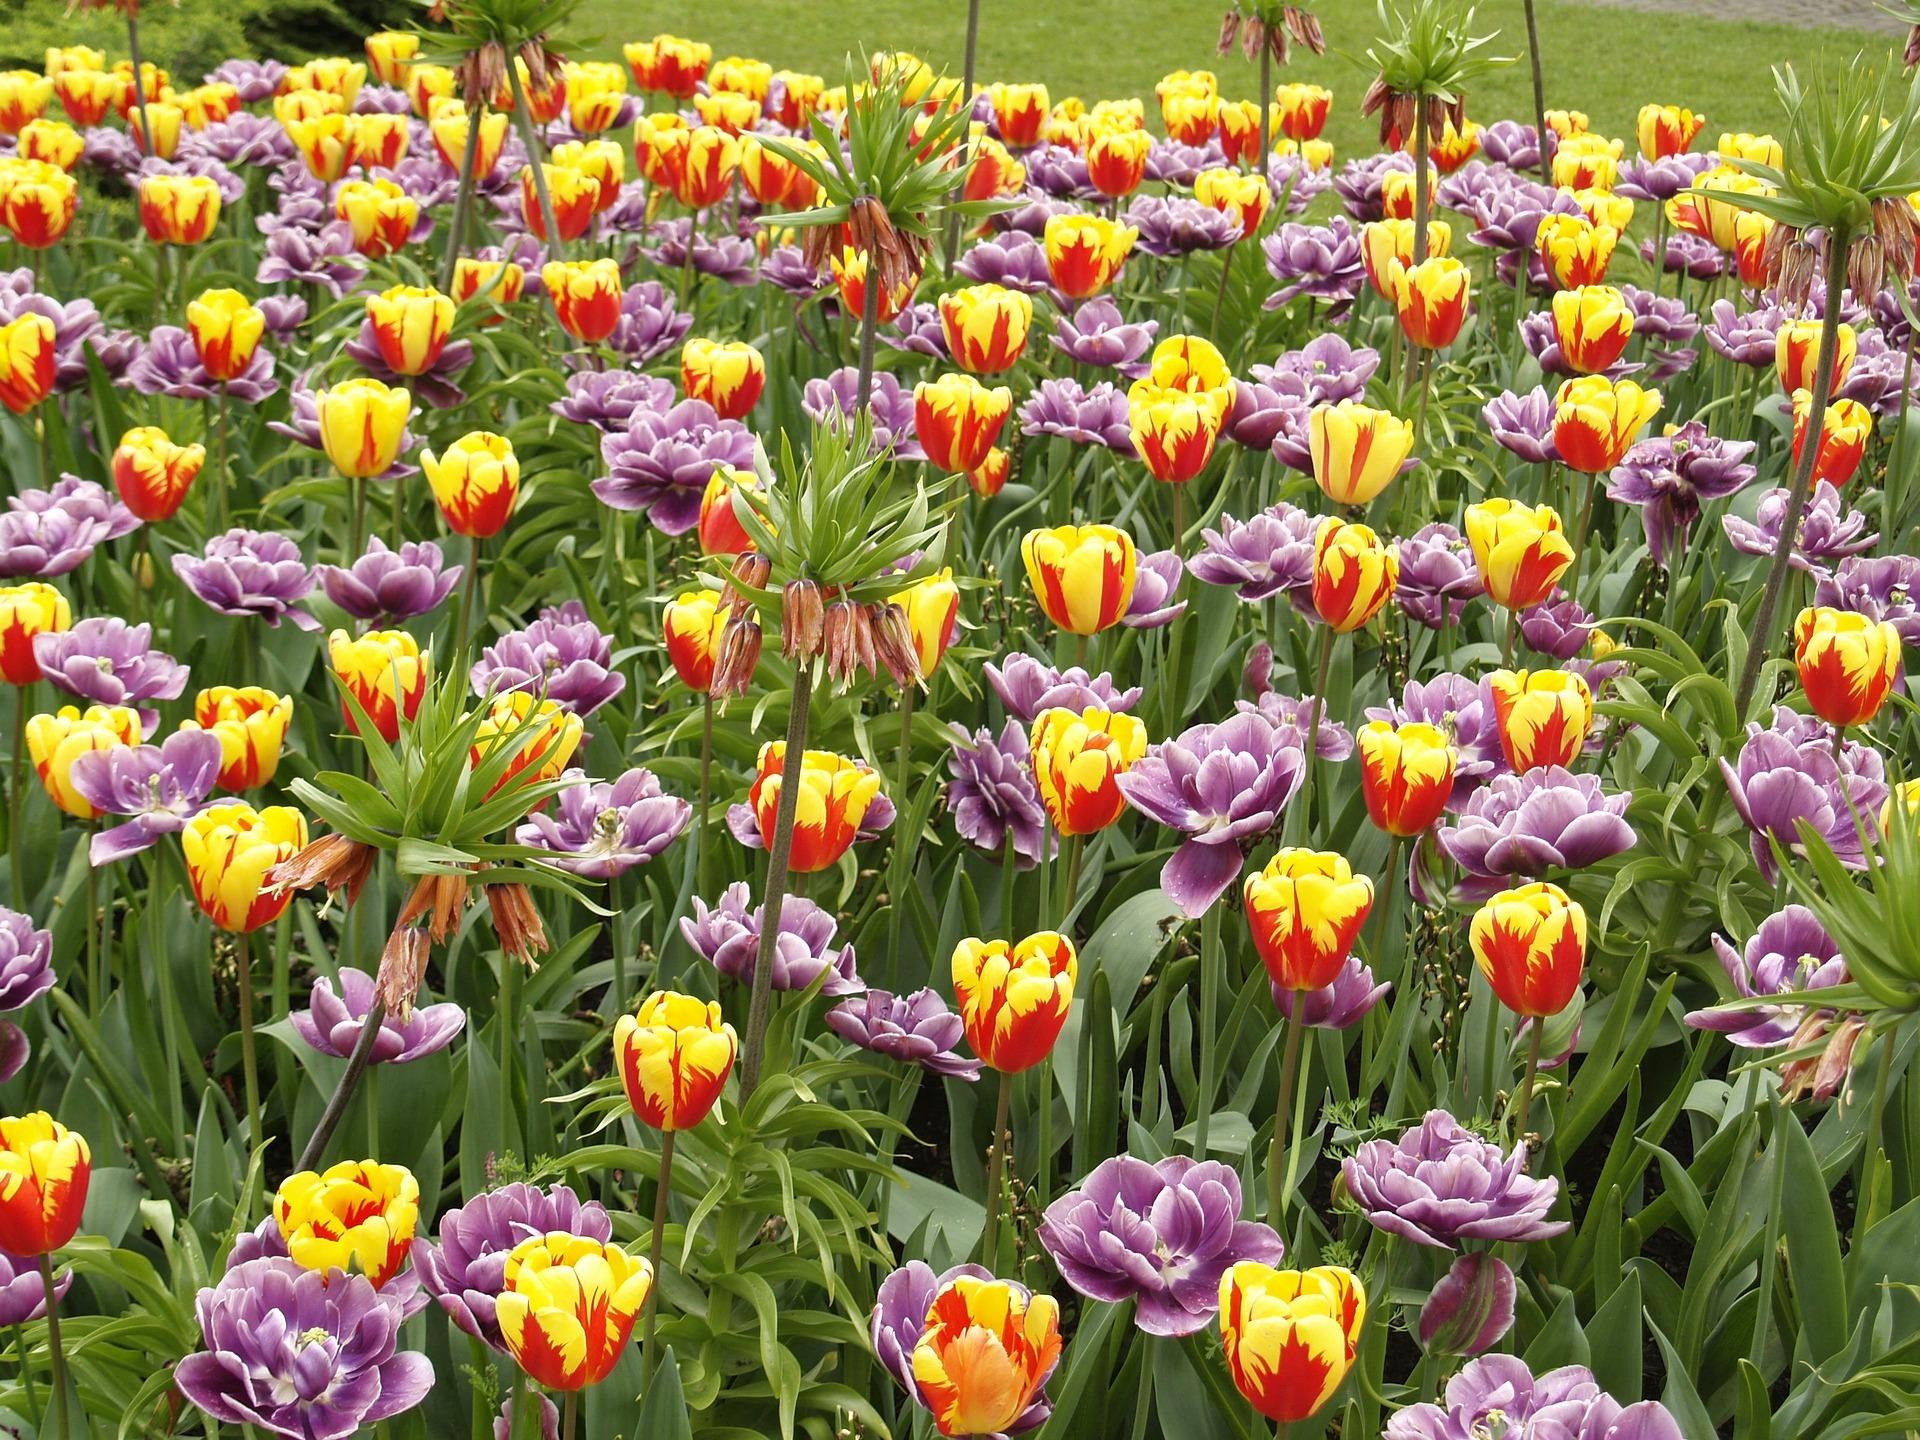 tulips-27771111920-1616406989.jpg